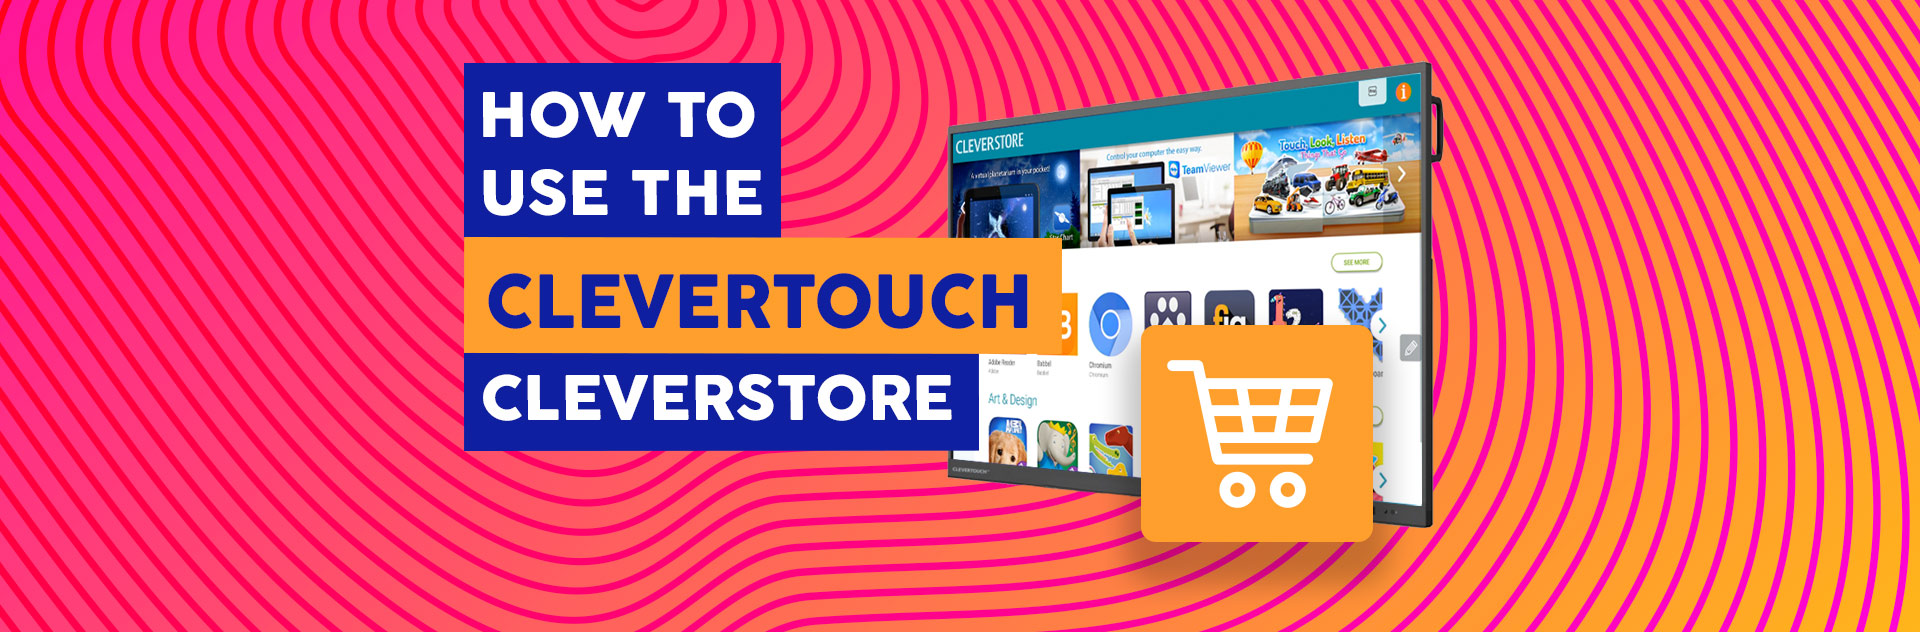 How Use Cleverstore Store - Interactive Flatscreens Schools